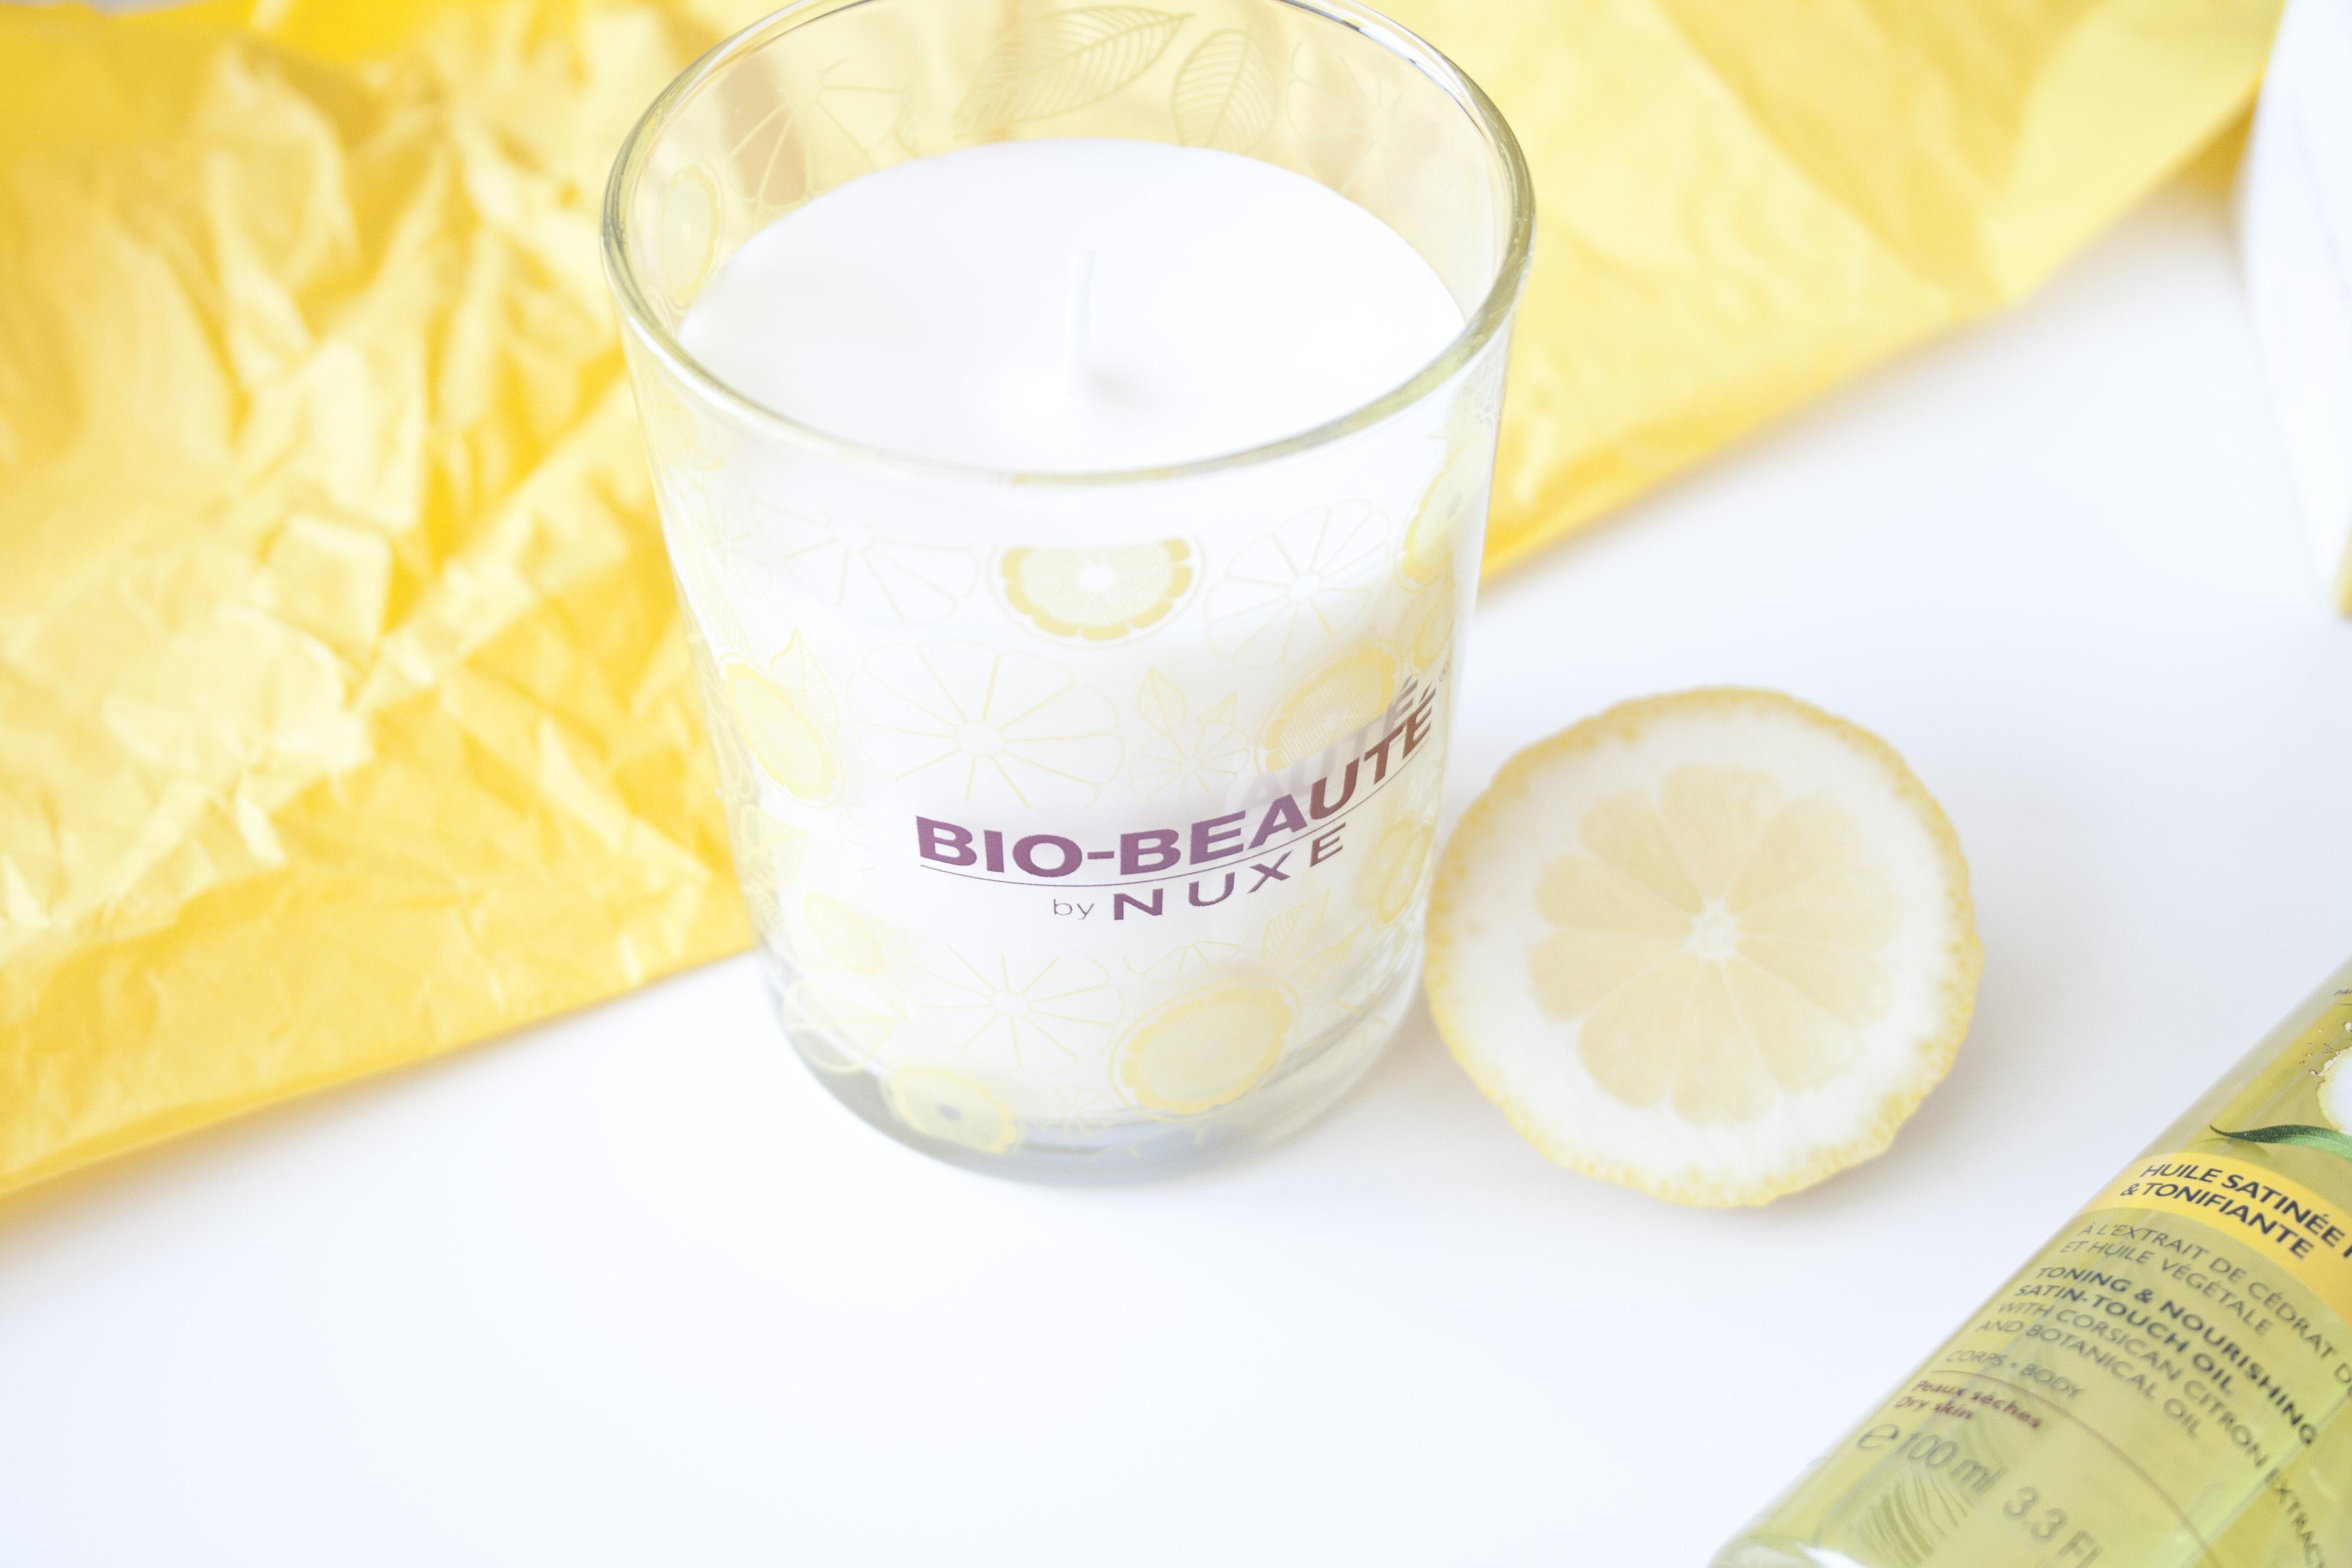 bio-beaute bio beaute nuxe oil corisca lemon oil Bio Beauté Toning Nourishing Satin-Touch Oil dry skin cosmetics biocosmetics organic cosmetics